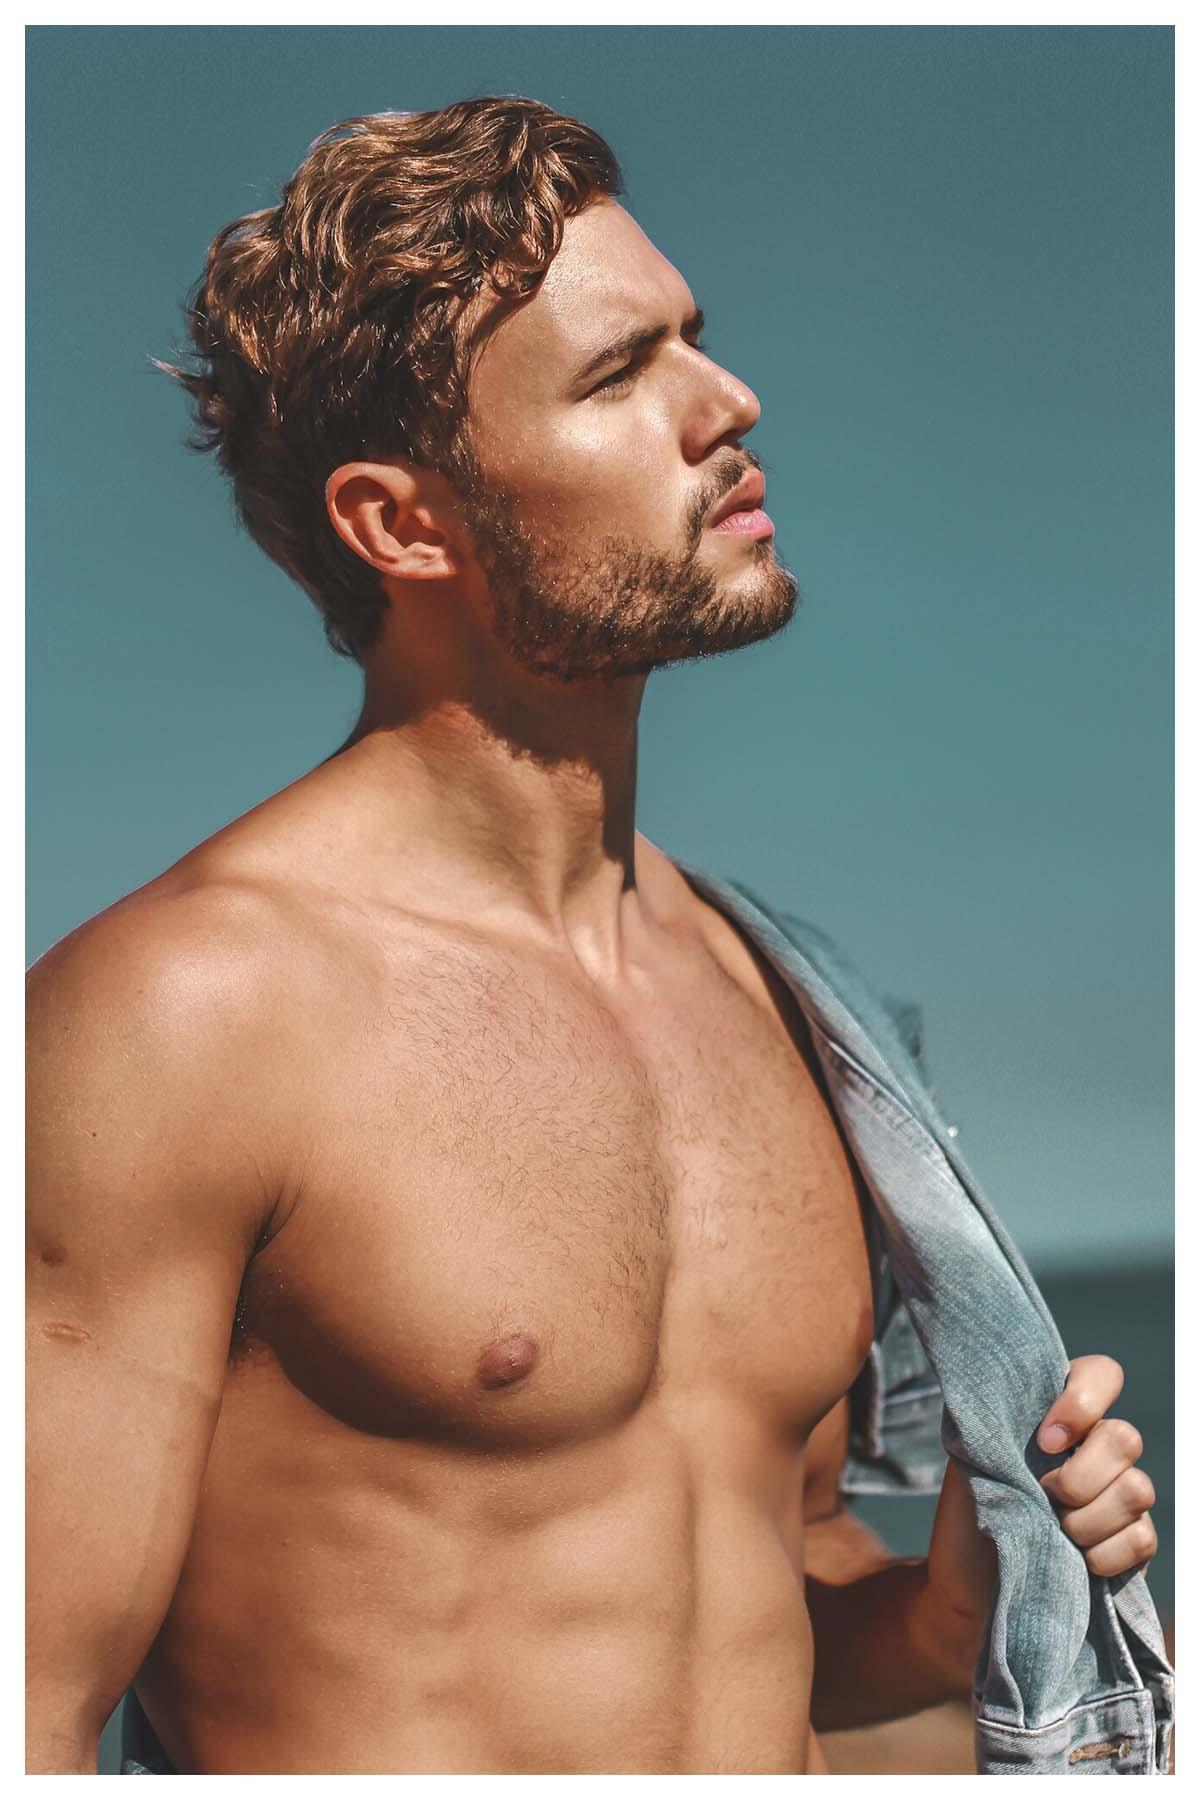 Igor Macedo by Anderson Marques for Brazilian Male Model